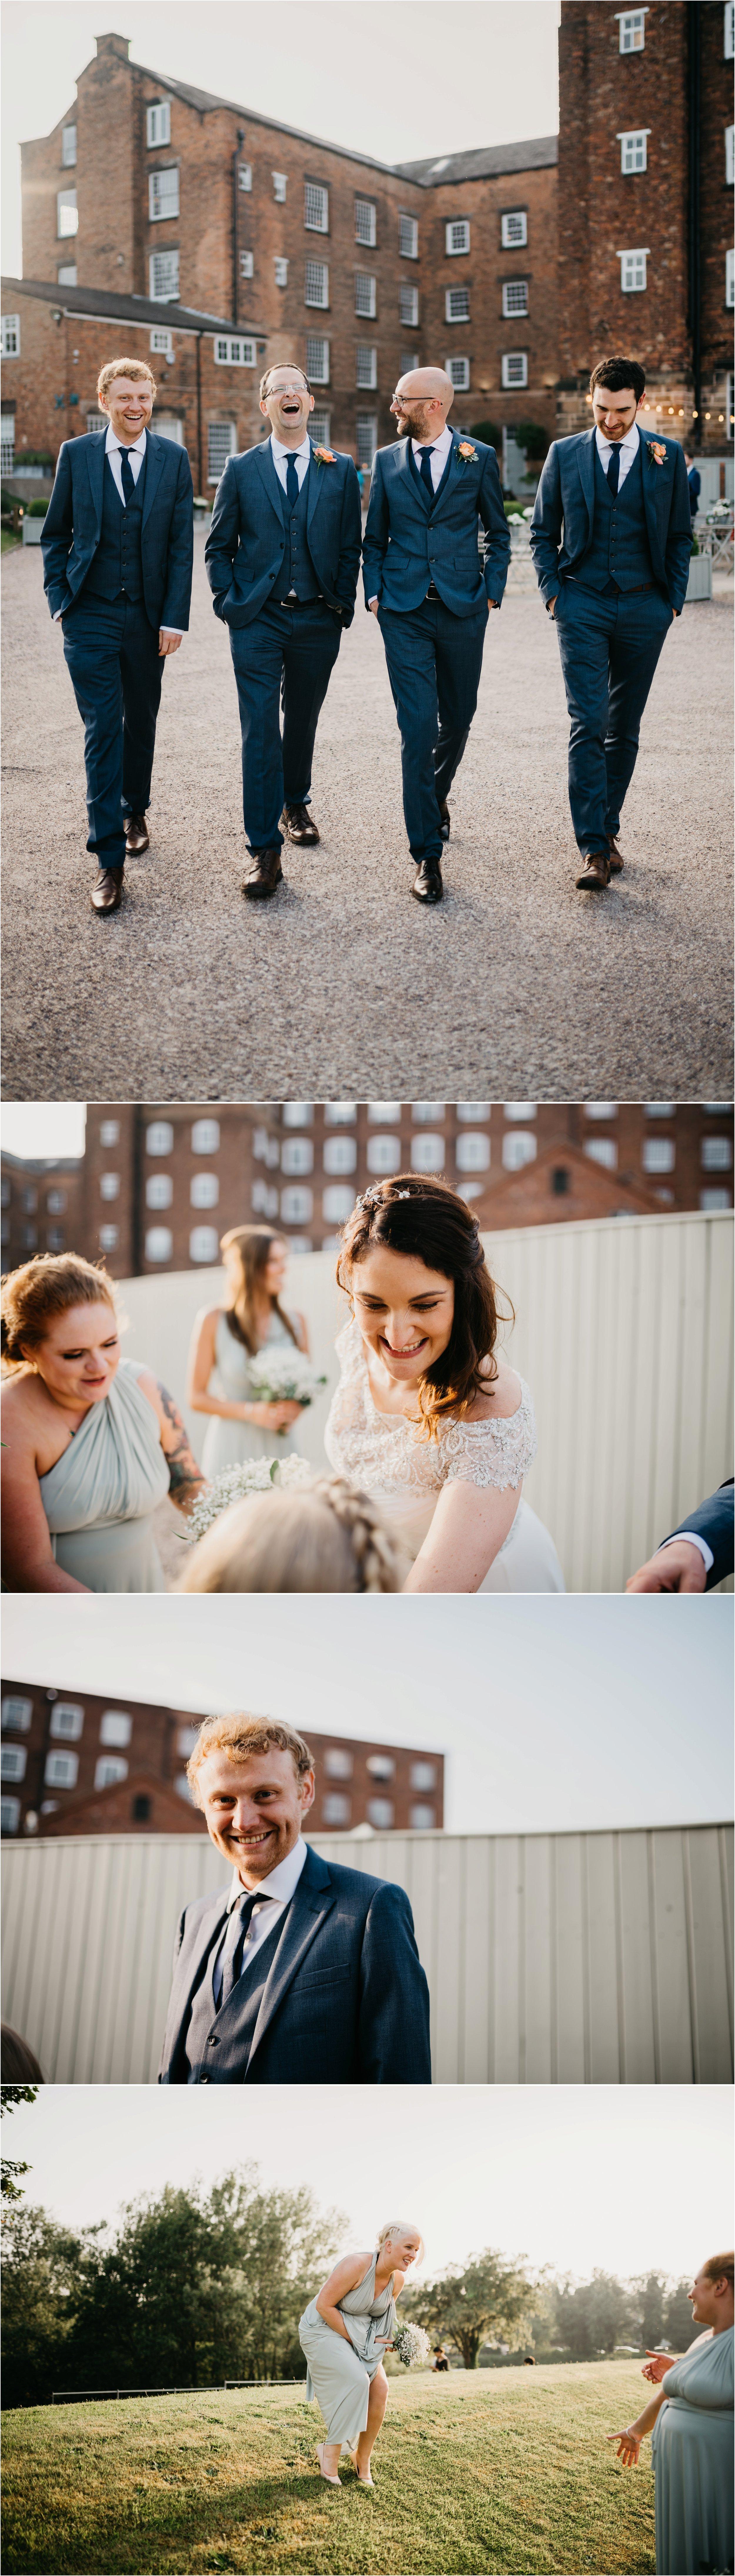 West Mill wedding photography_0075.jpg